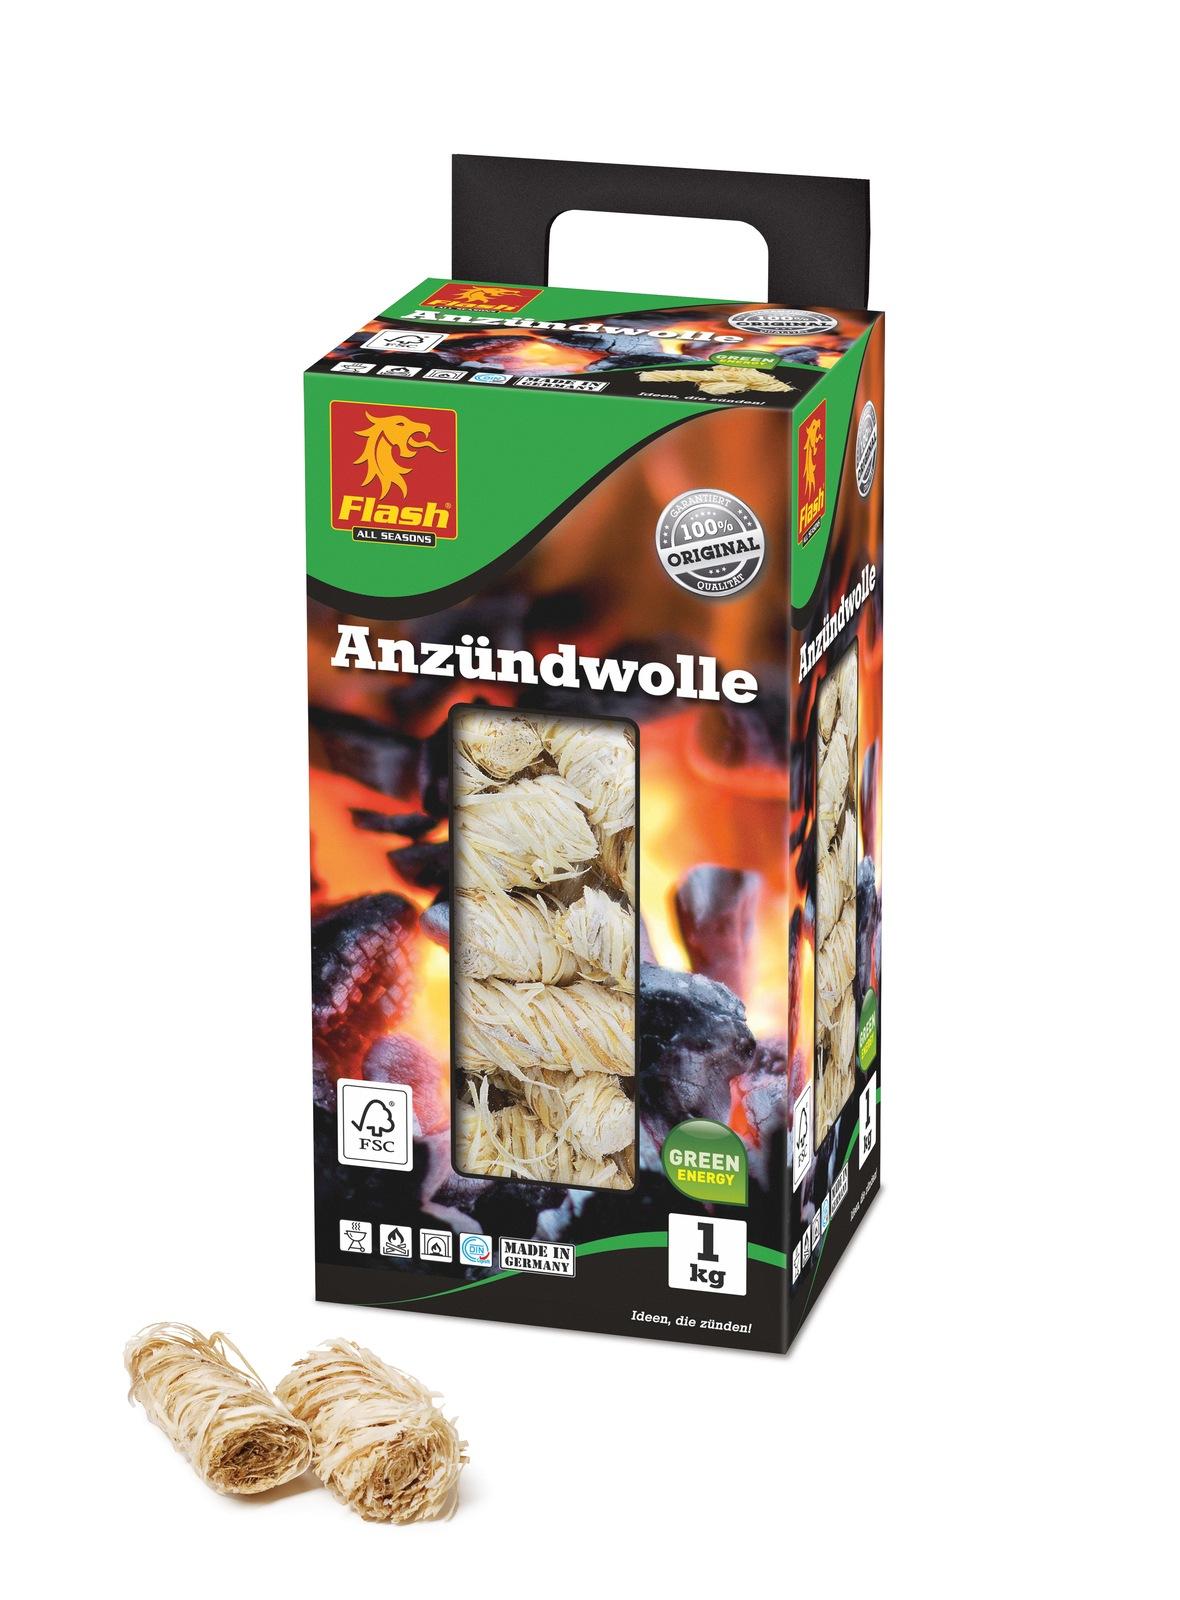 FLASH Anzündwolle 1kg Box